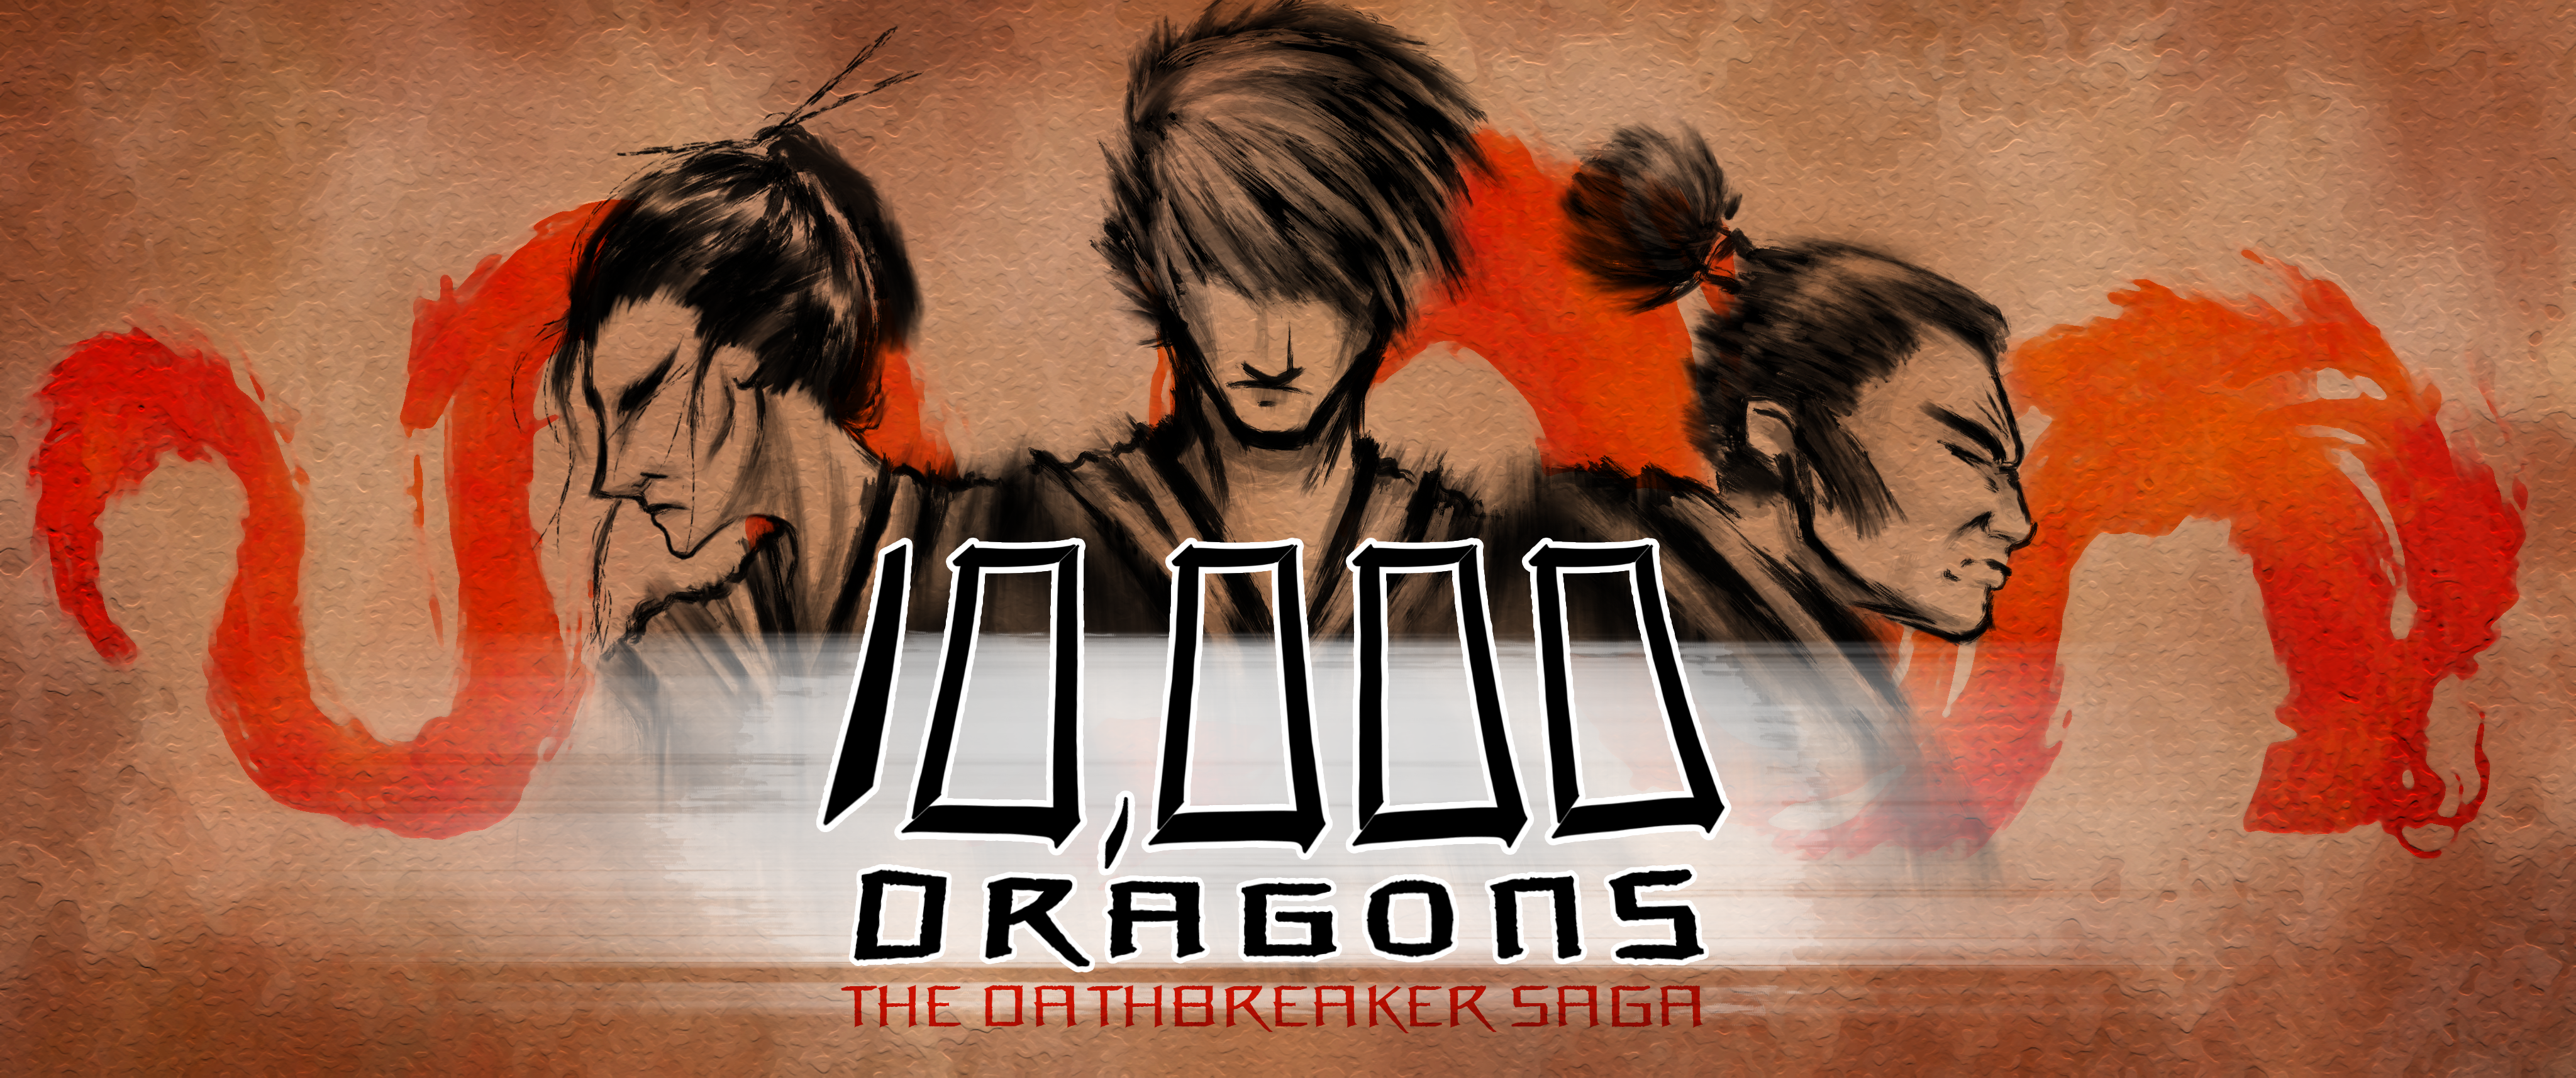 10,000 Dragons